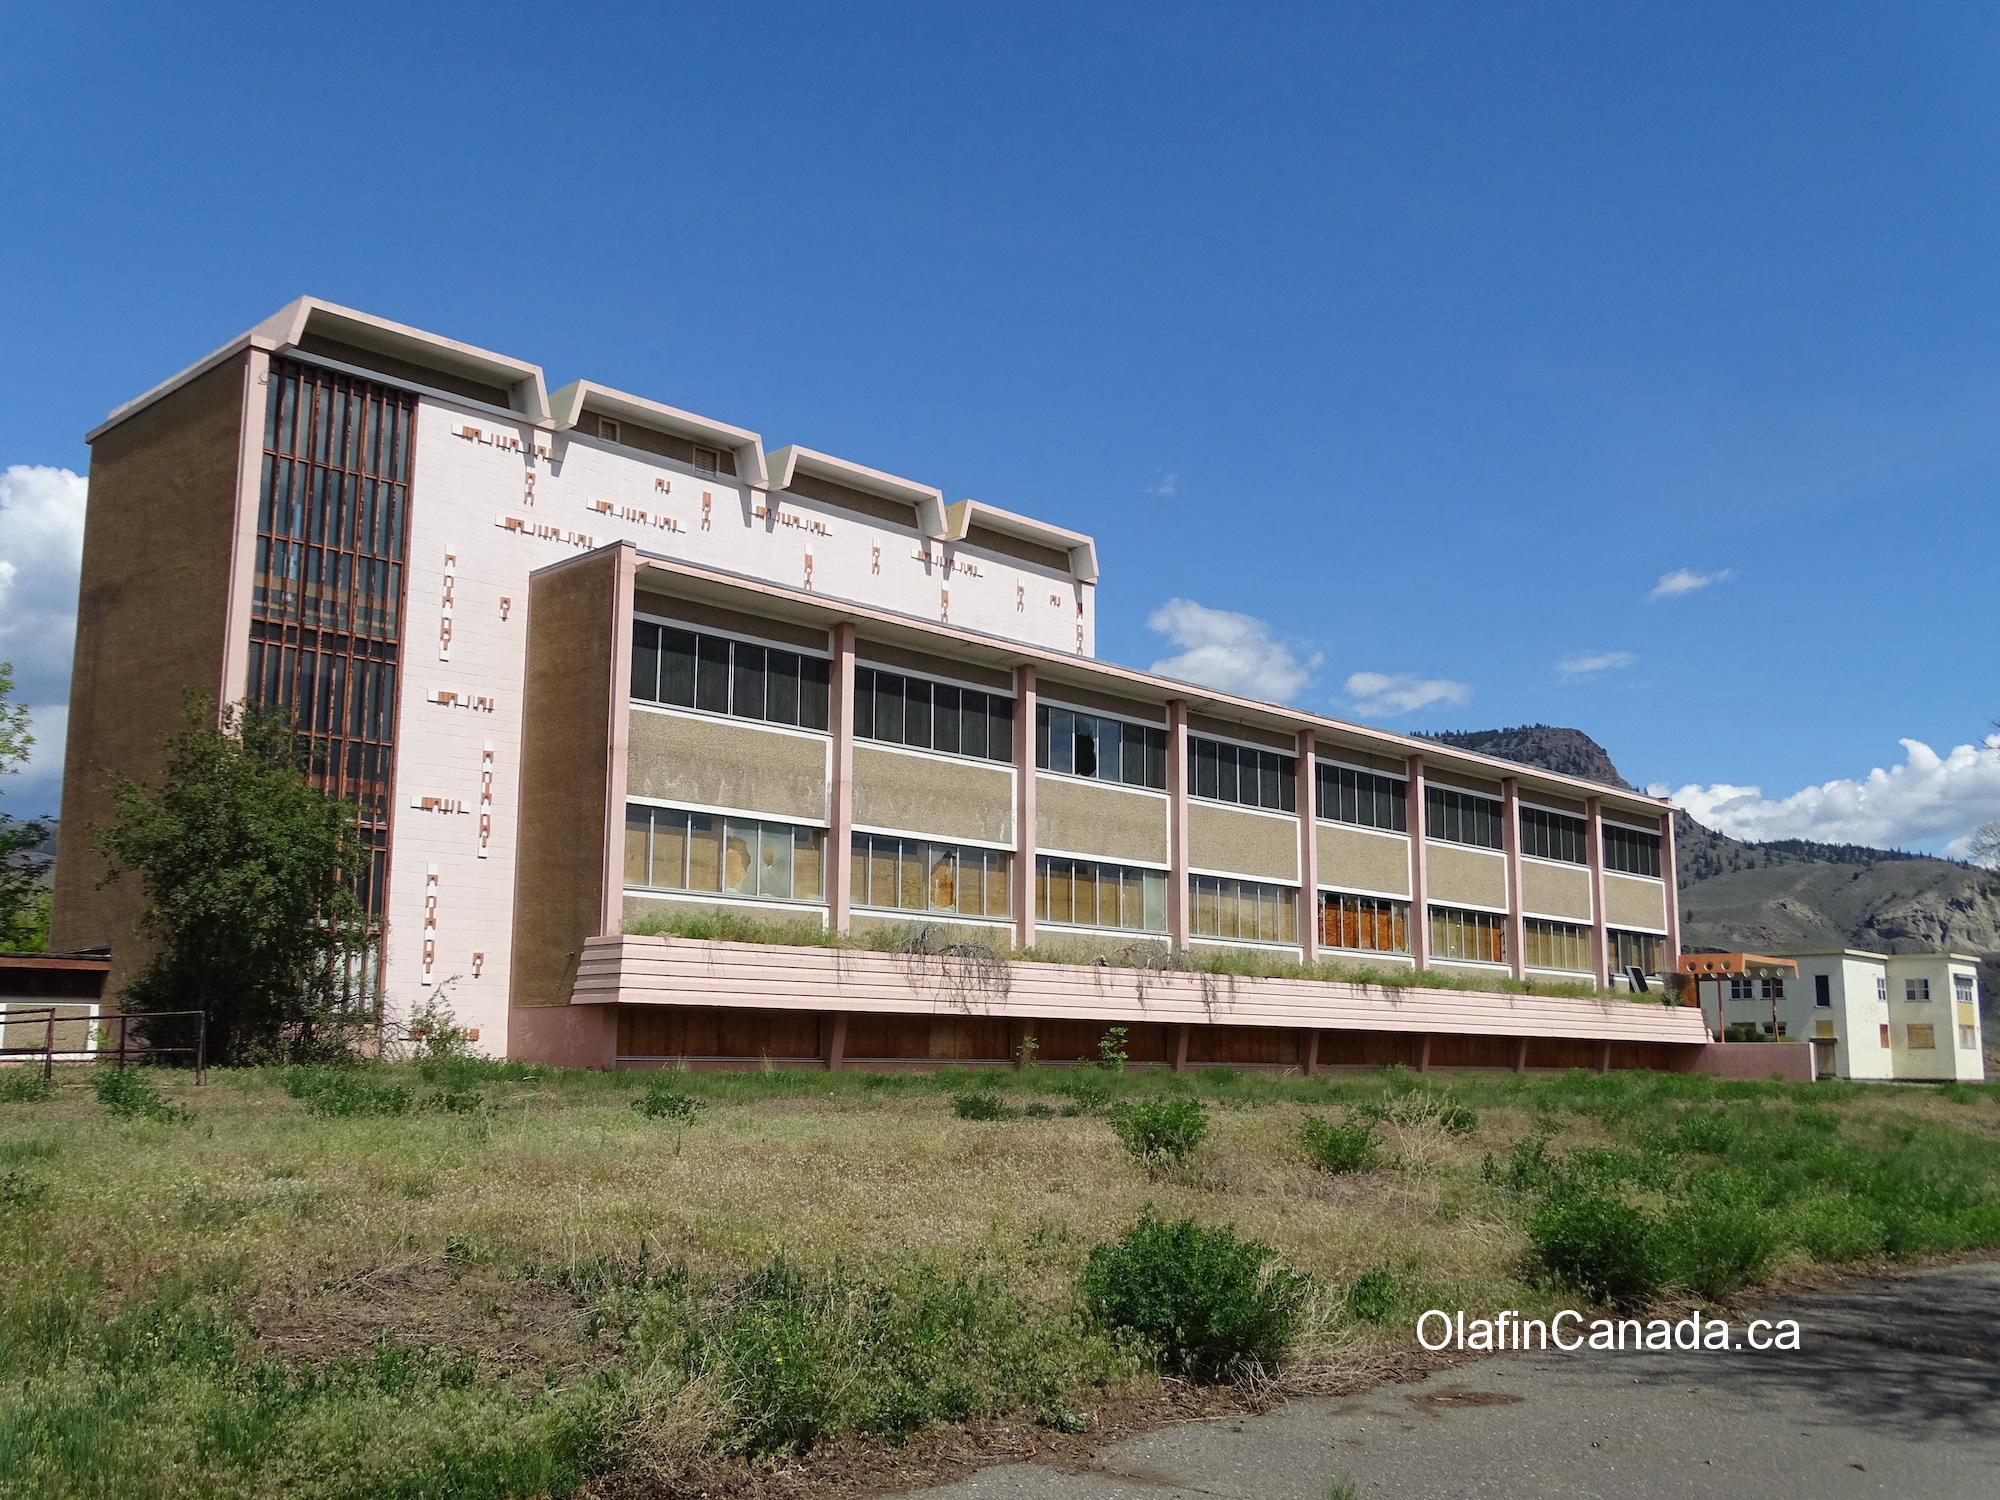 Sage hospital in Tranquille. #olafincanada #britishcolumbia #discoverbc #abandonedbc #tranquille